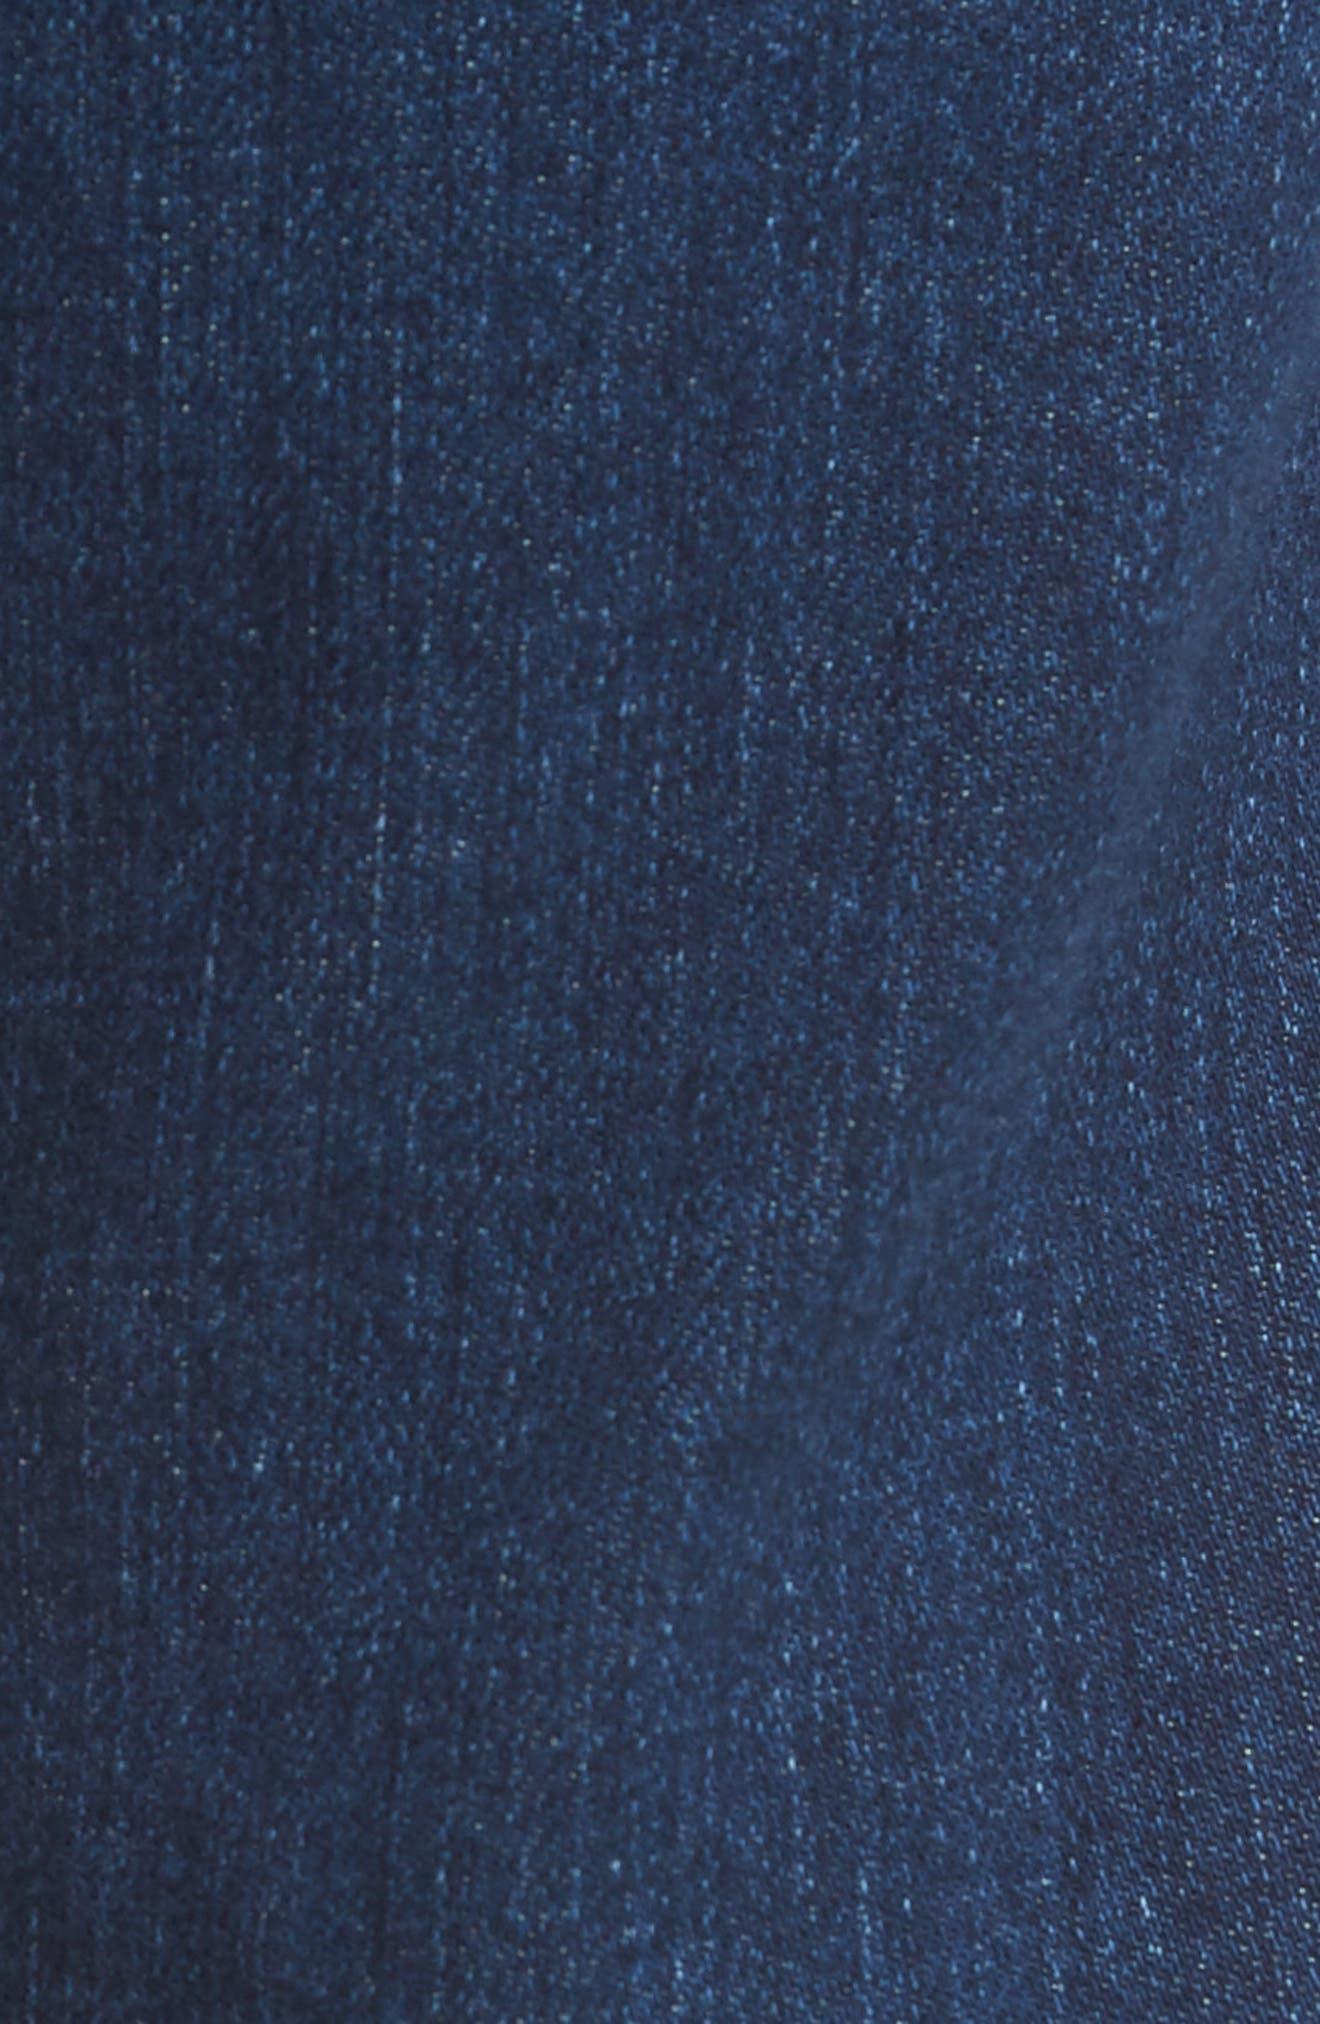 L'Homme Skinny Fit Jeans,                             Alternate thumbnail 5, color,                             420